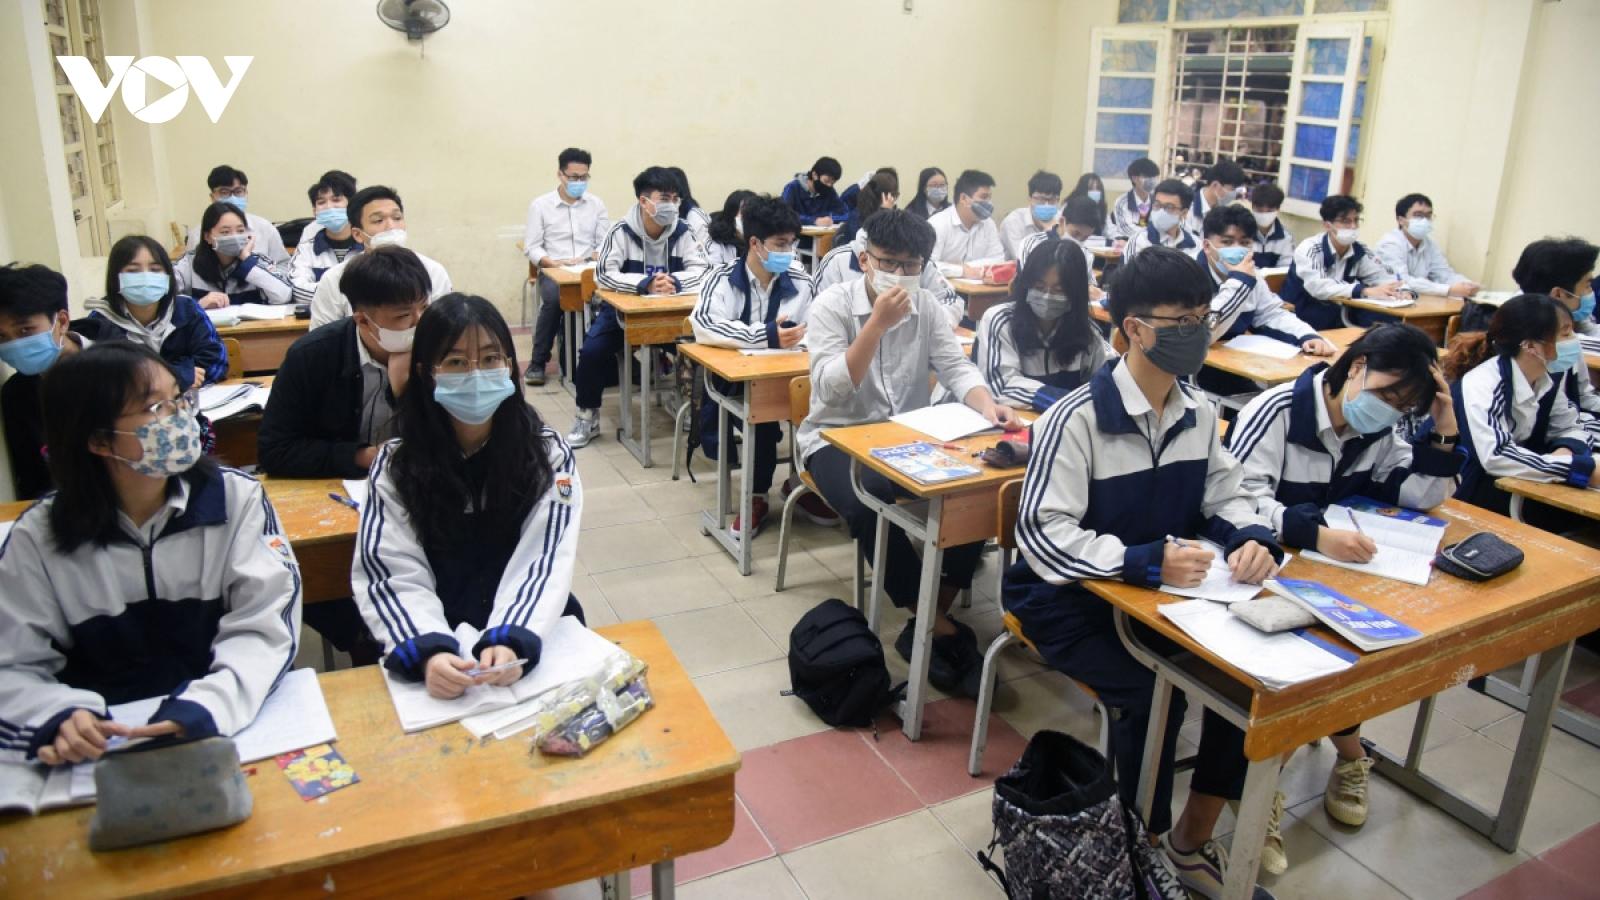 Students head back to school amid tight anti-coronavirus measures